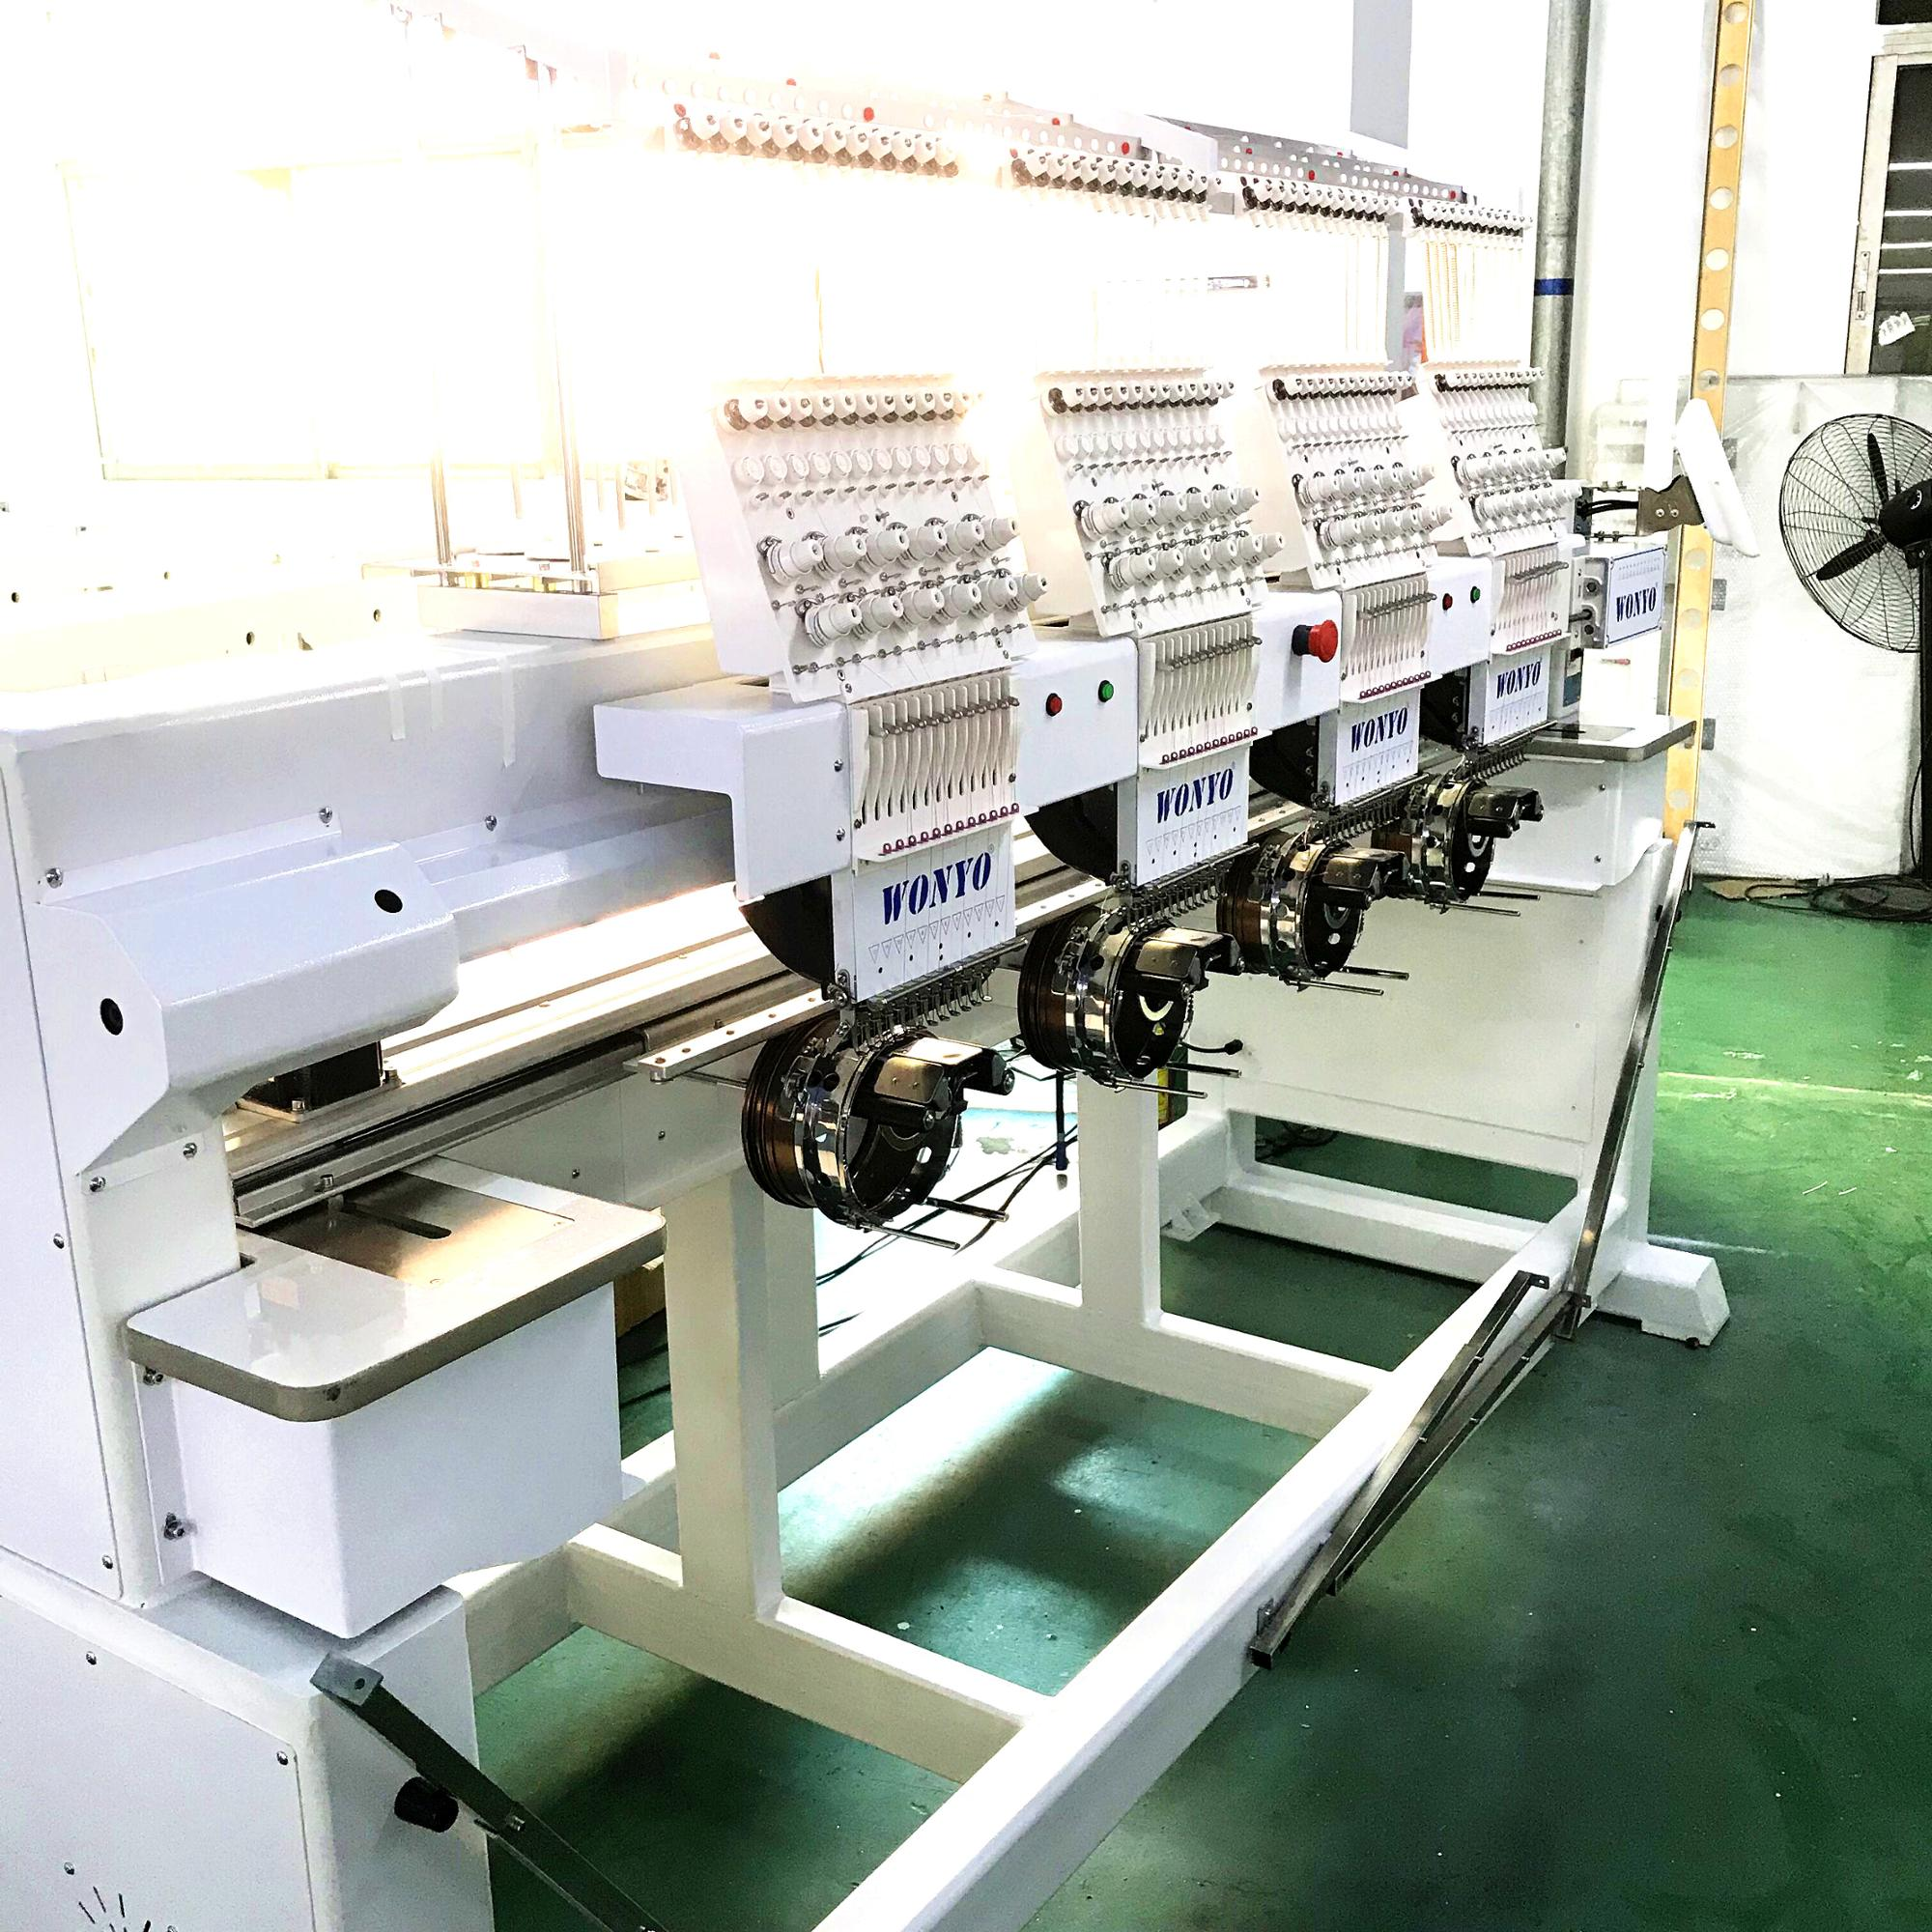 High Speed Tajima 4 Head Embroidery Machine for hats shoes cloth